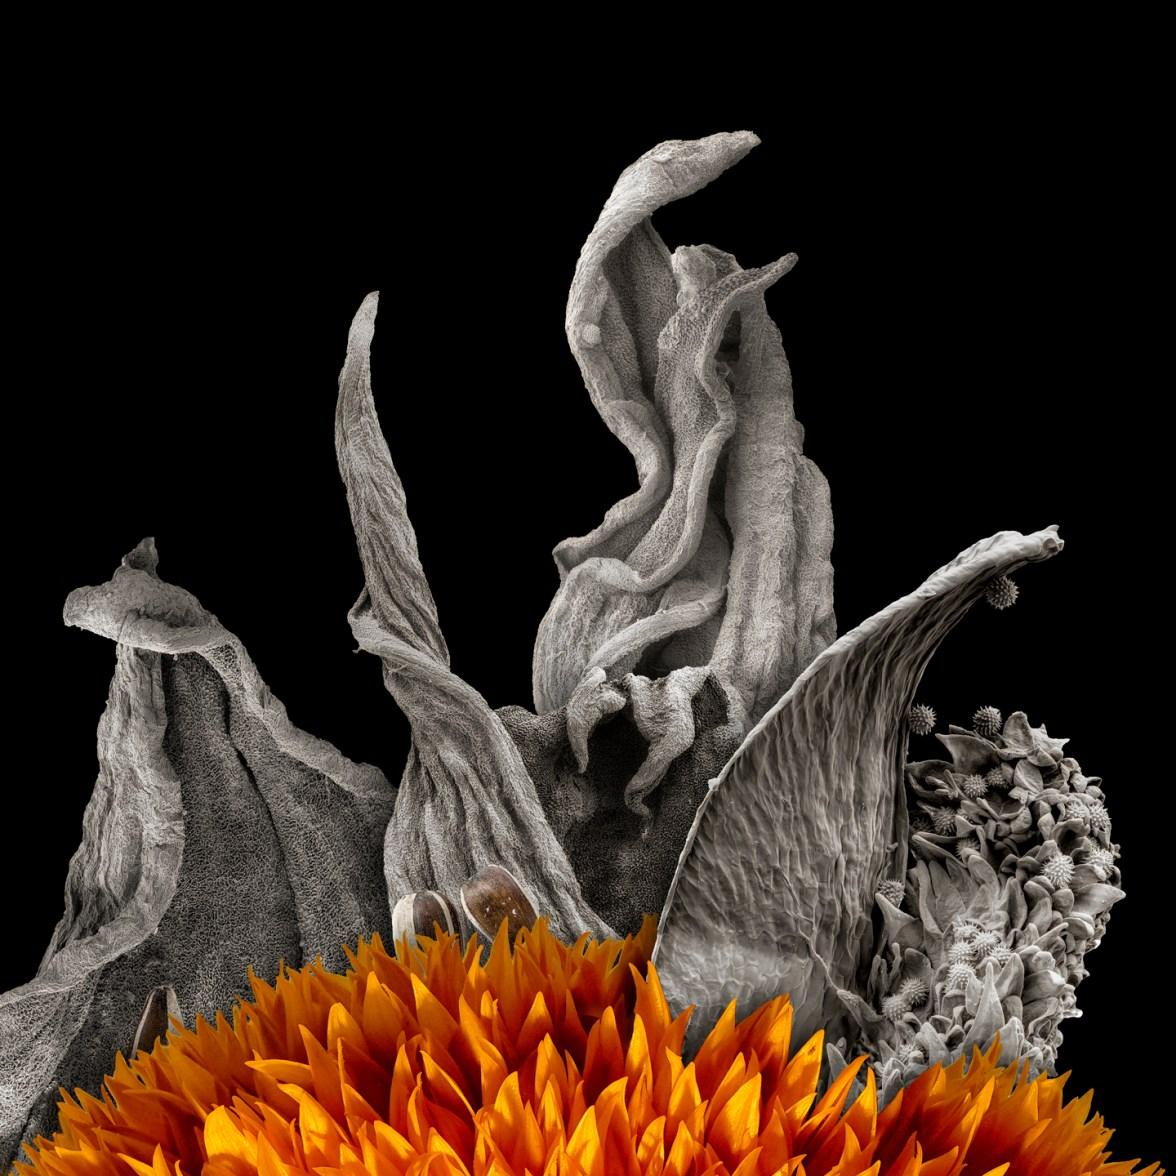 Sunflower © Robert Dash